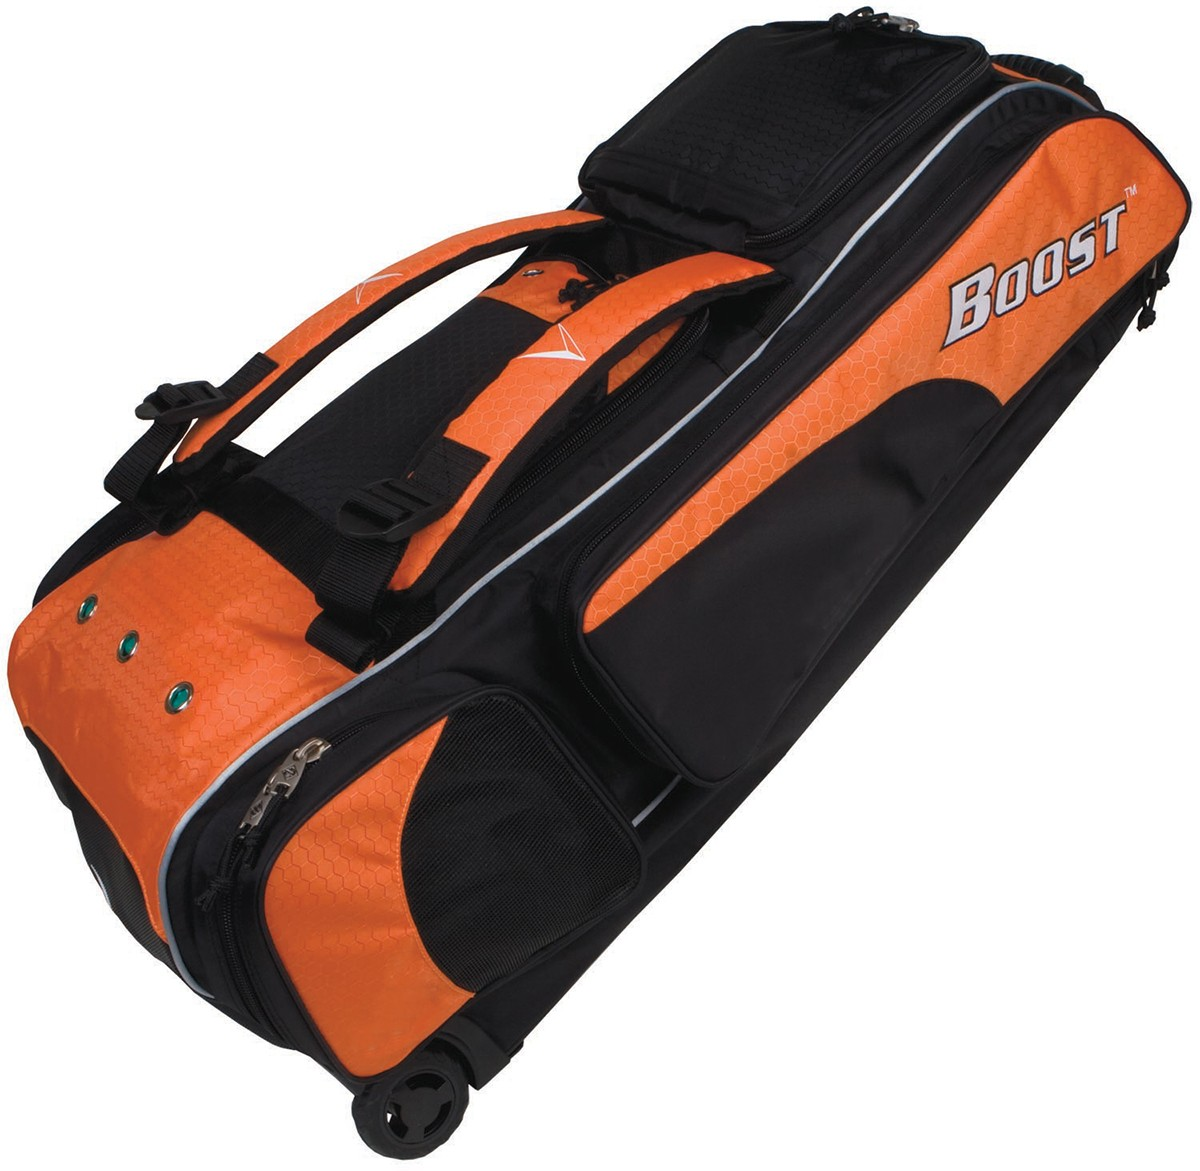 Diamond Boost Wheeled Baseball Softball Equipment Bag 35 L X 13 W 12 H